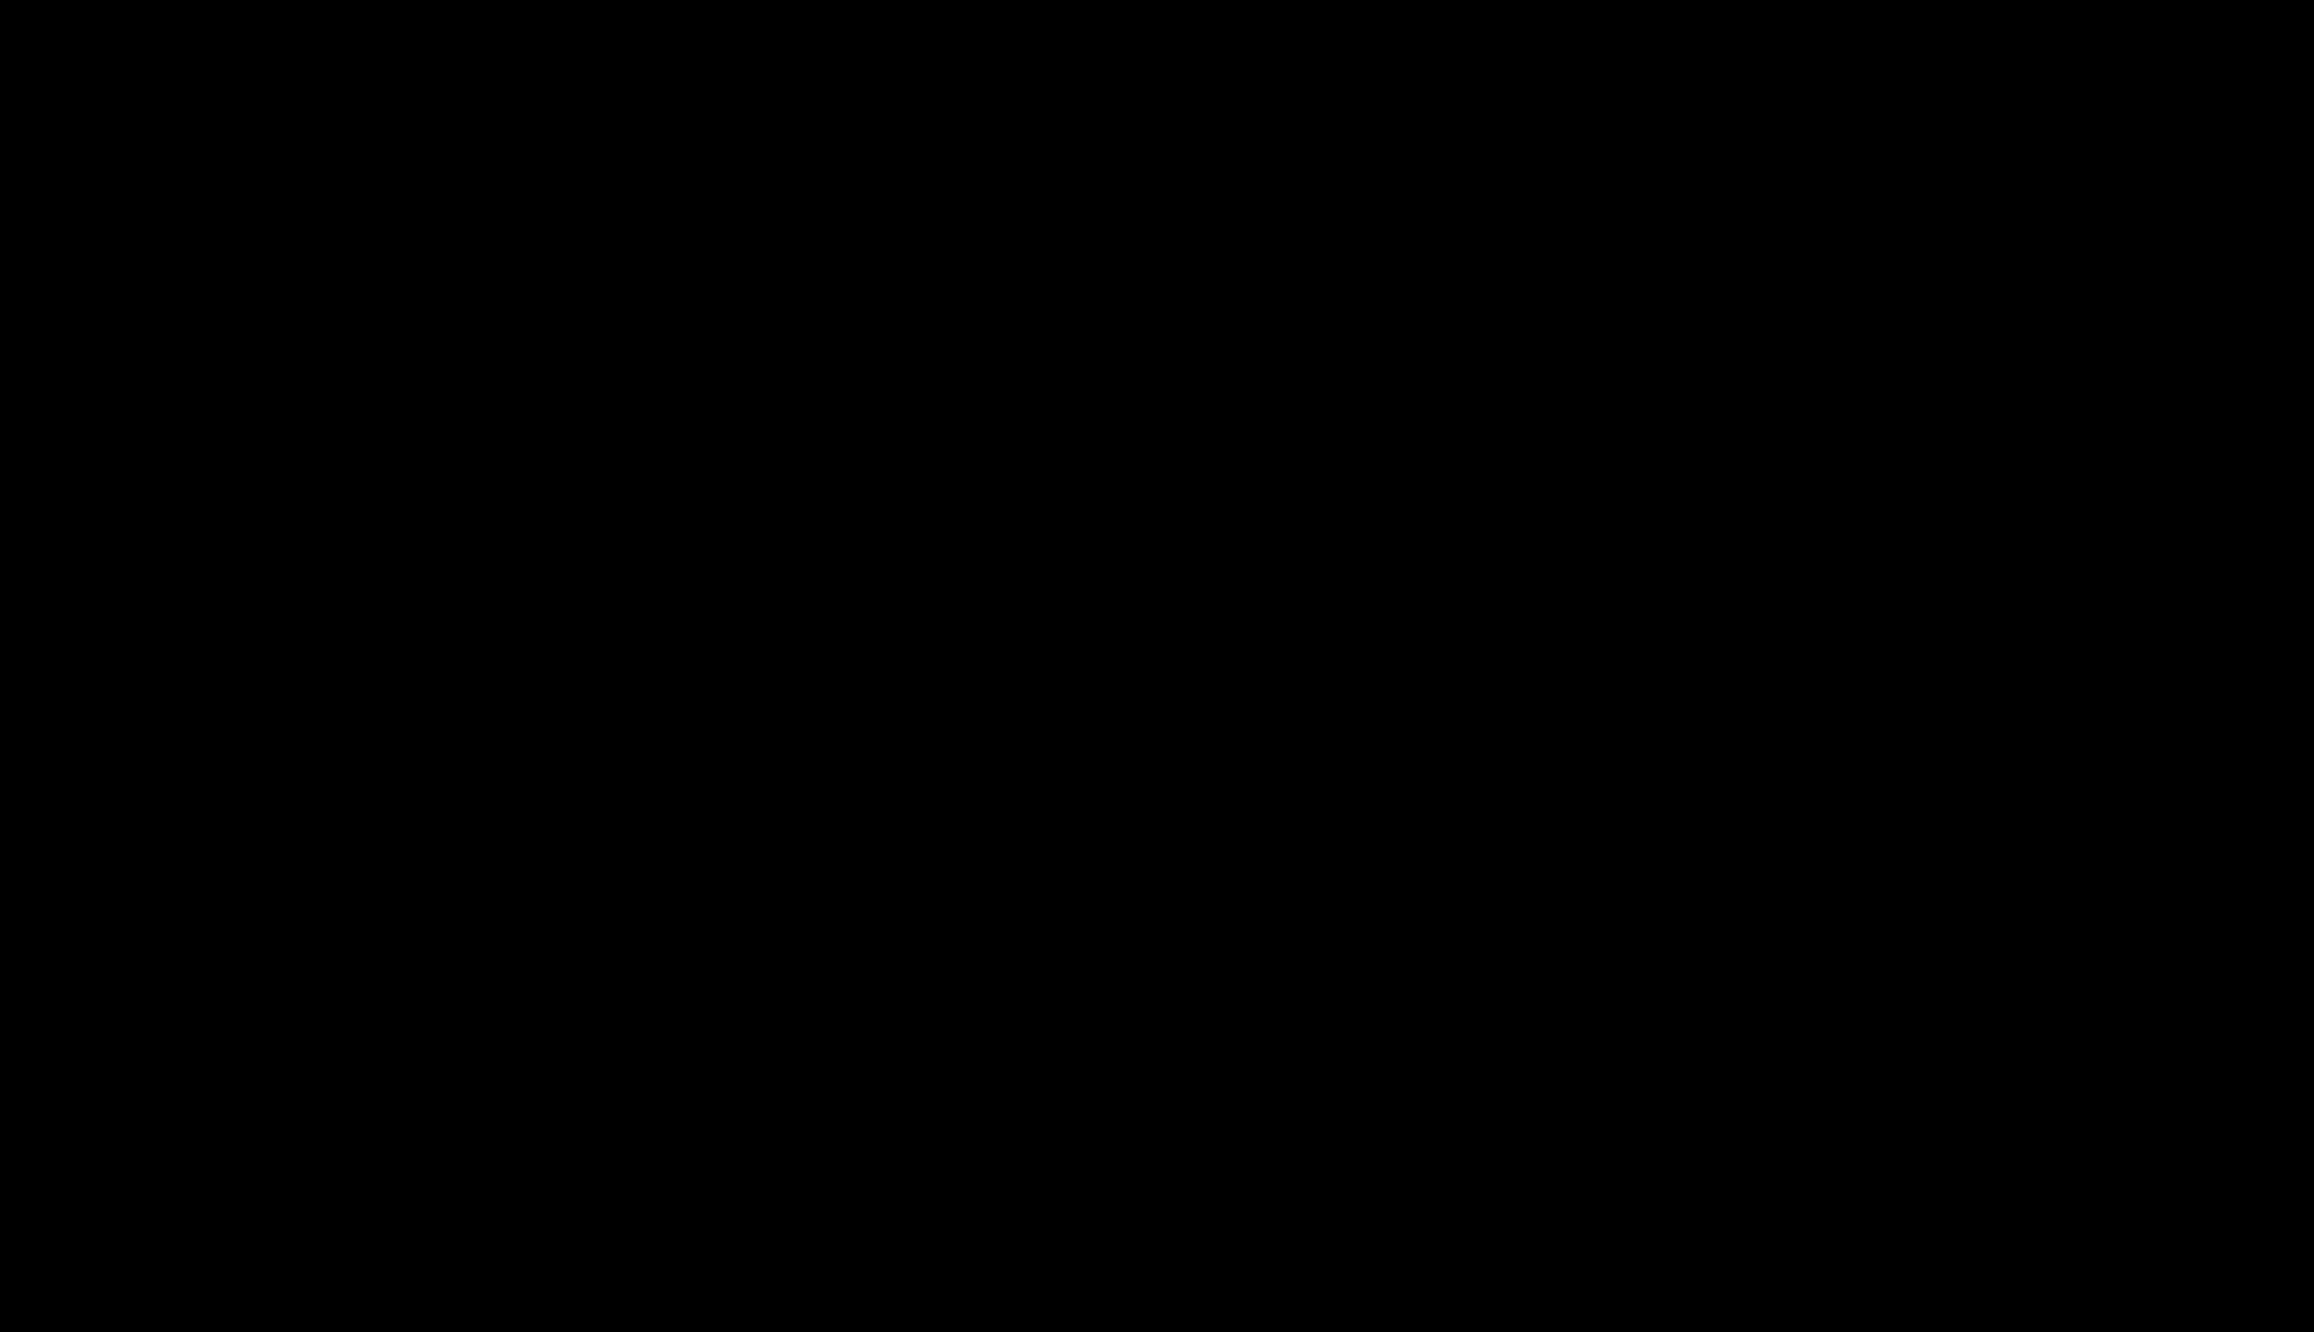 2314x1332 Clipart